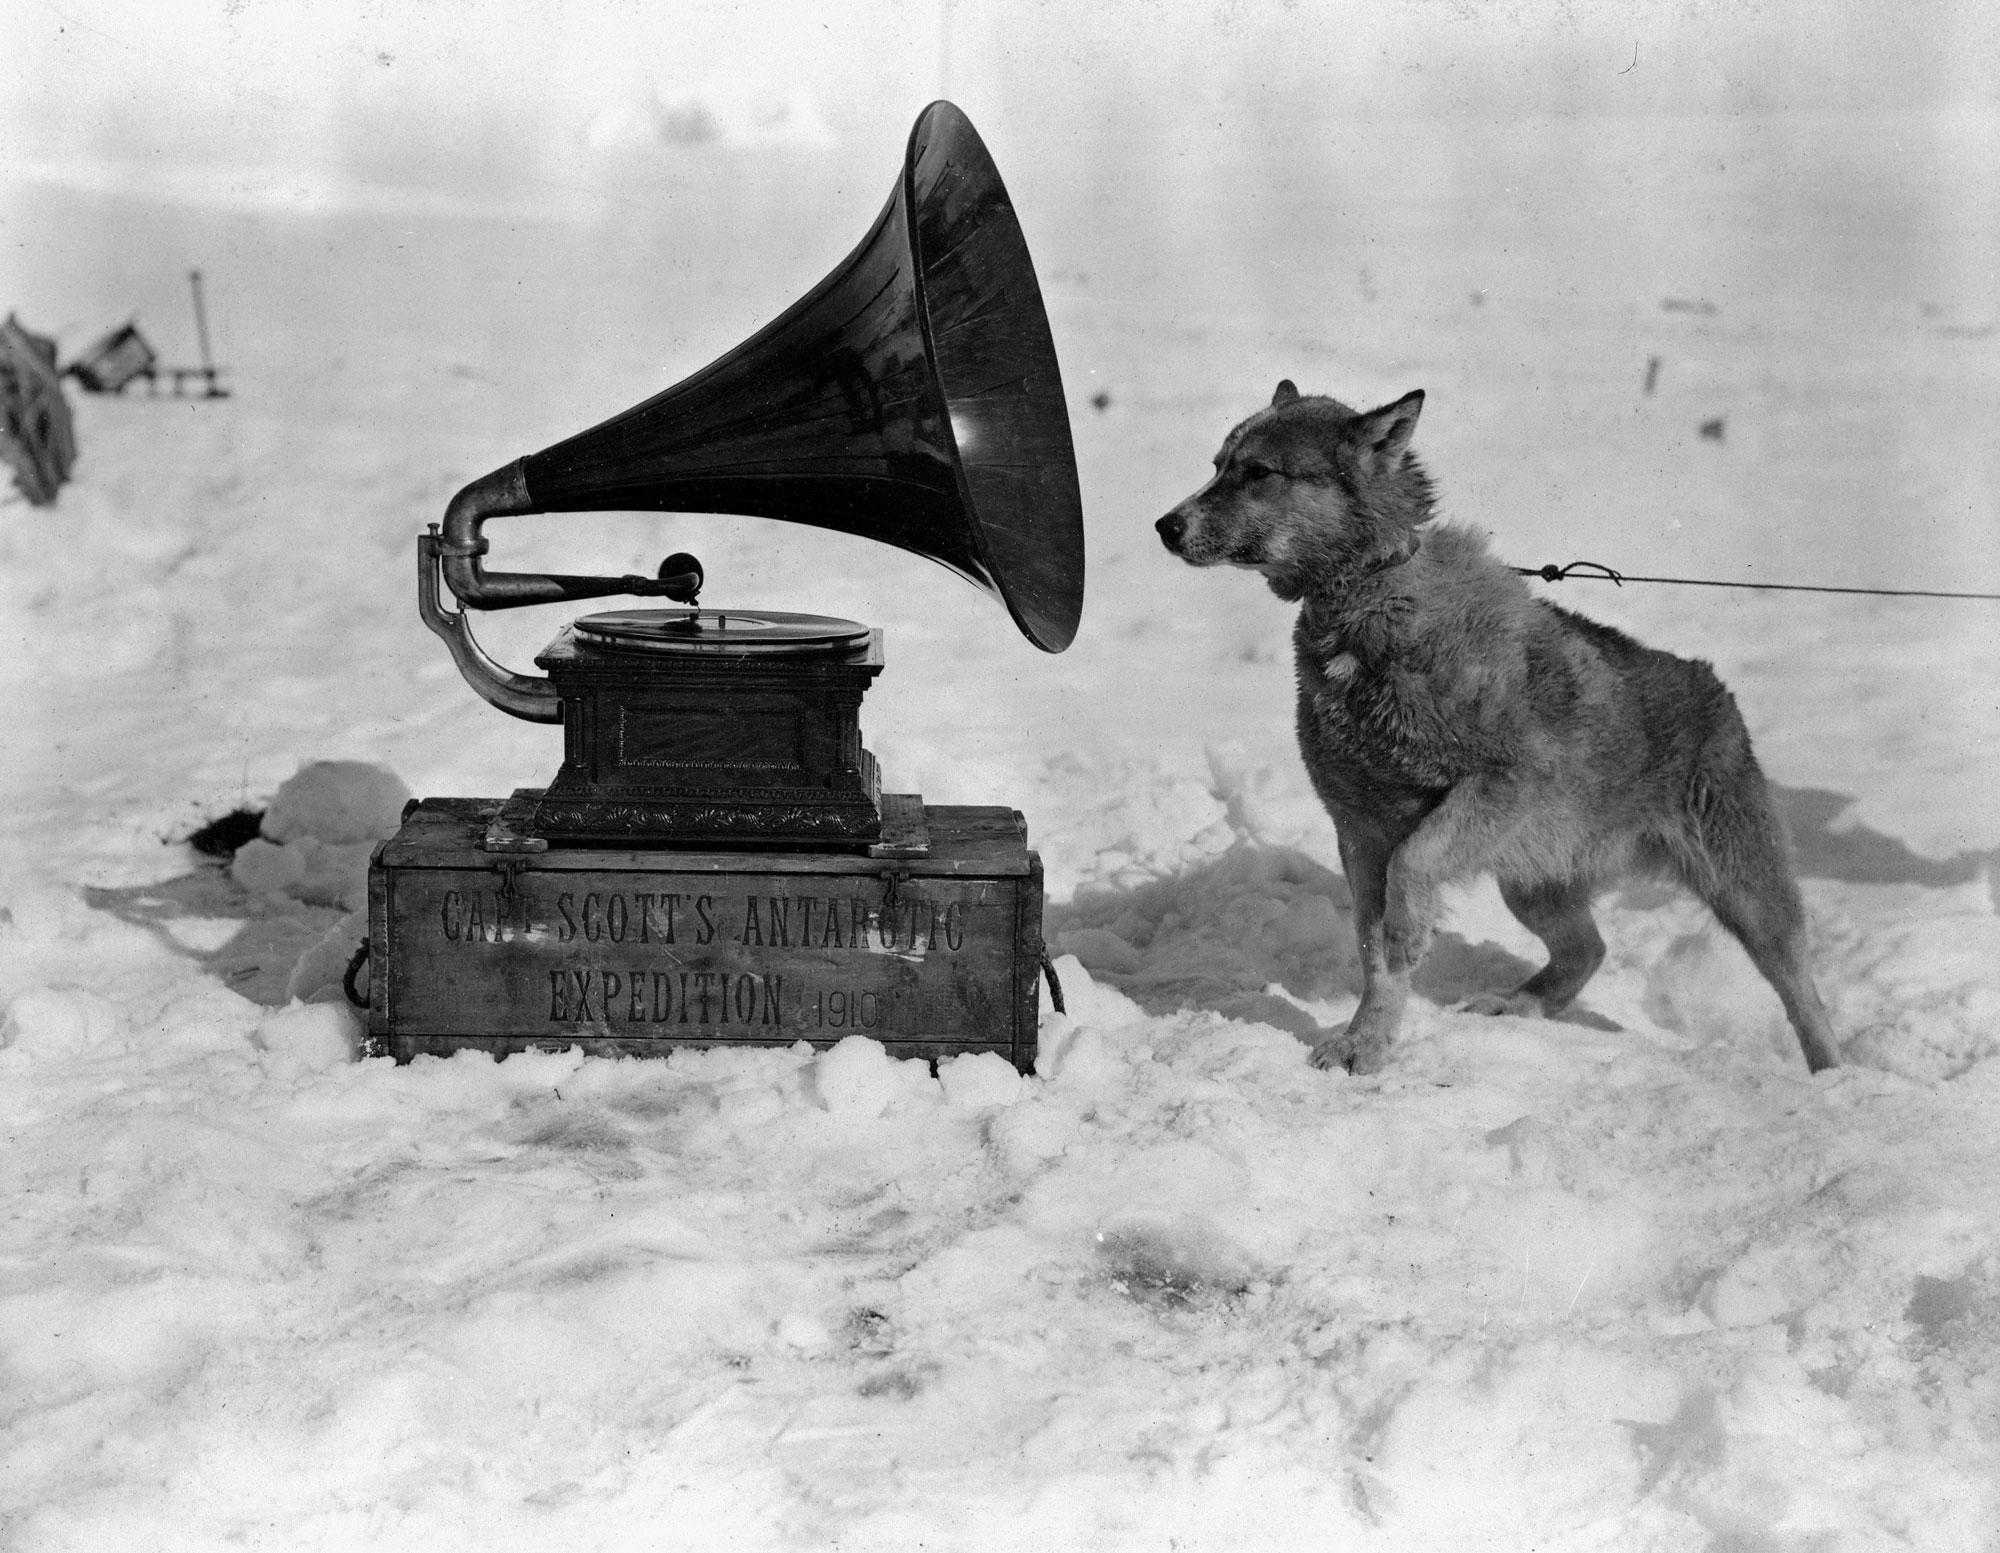 ponting_1911_dog_listening_to_gramophone_antartica-1.jpg